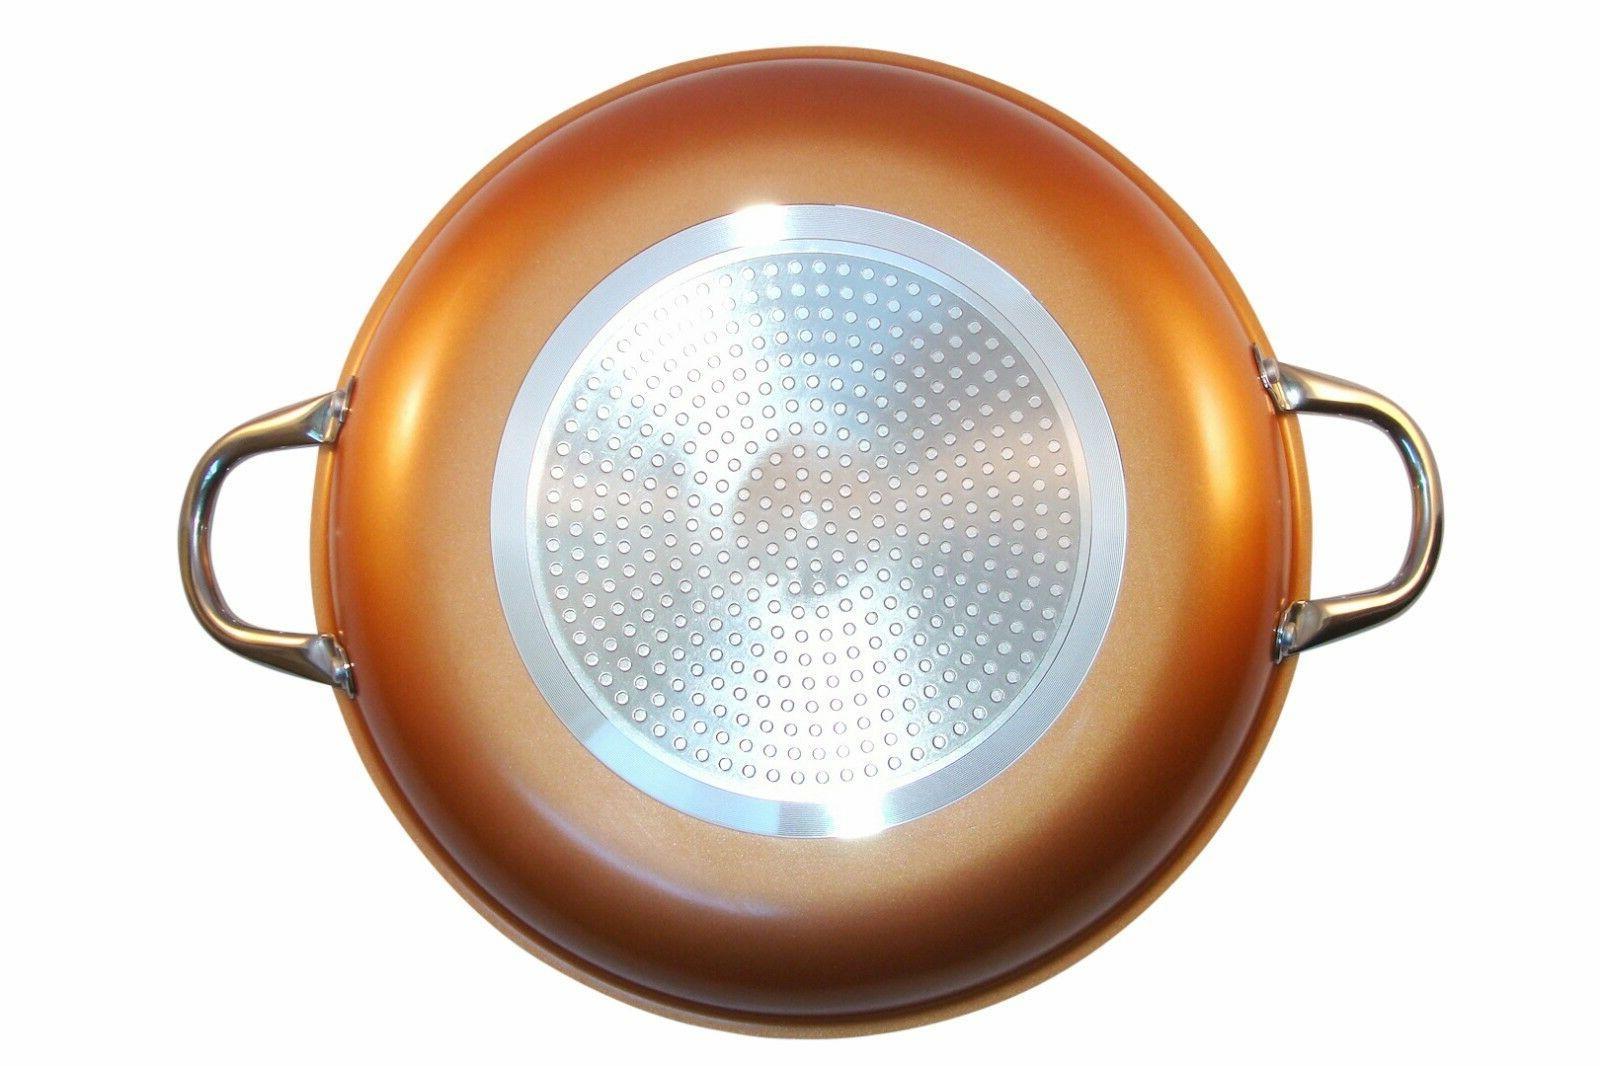 Copper Pan inches Ceramic Non Stick Induction